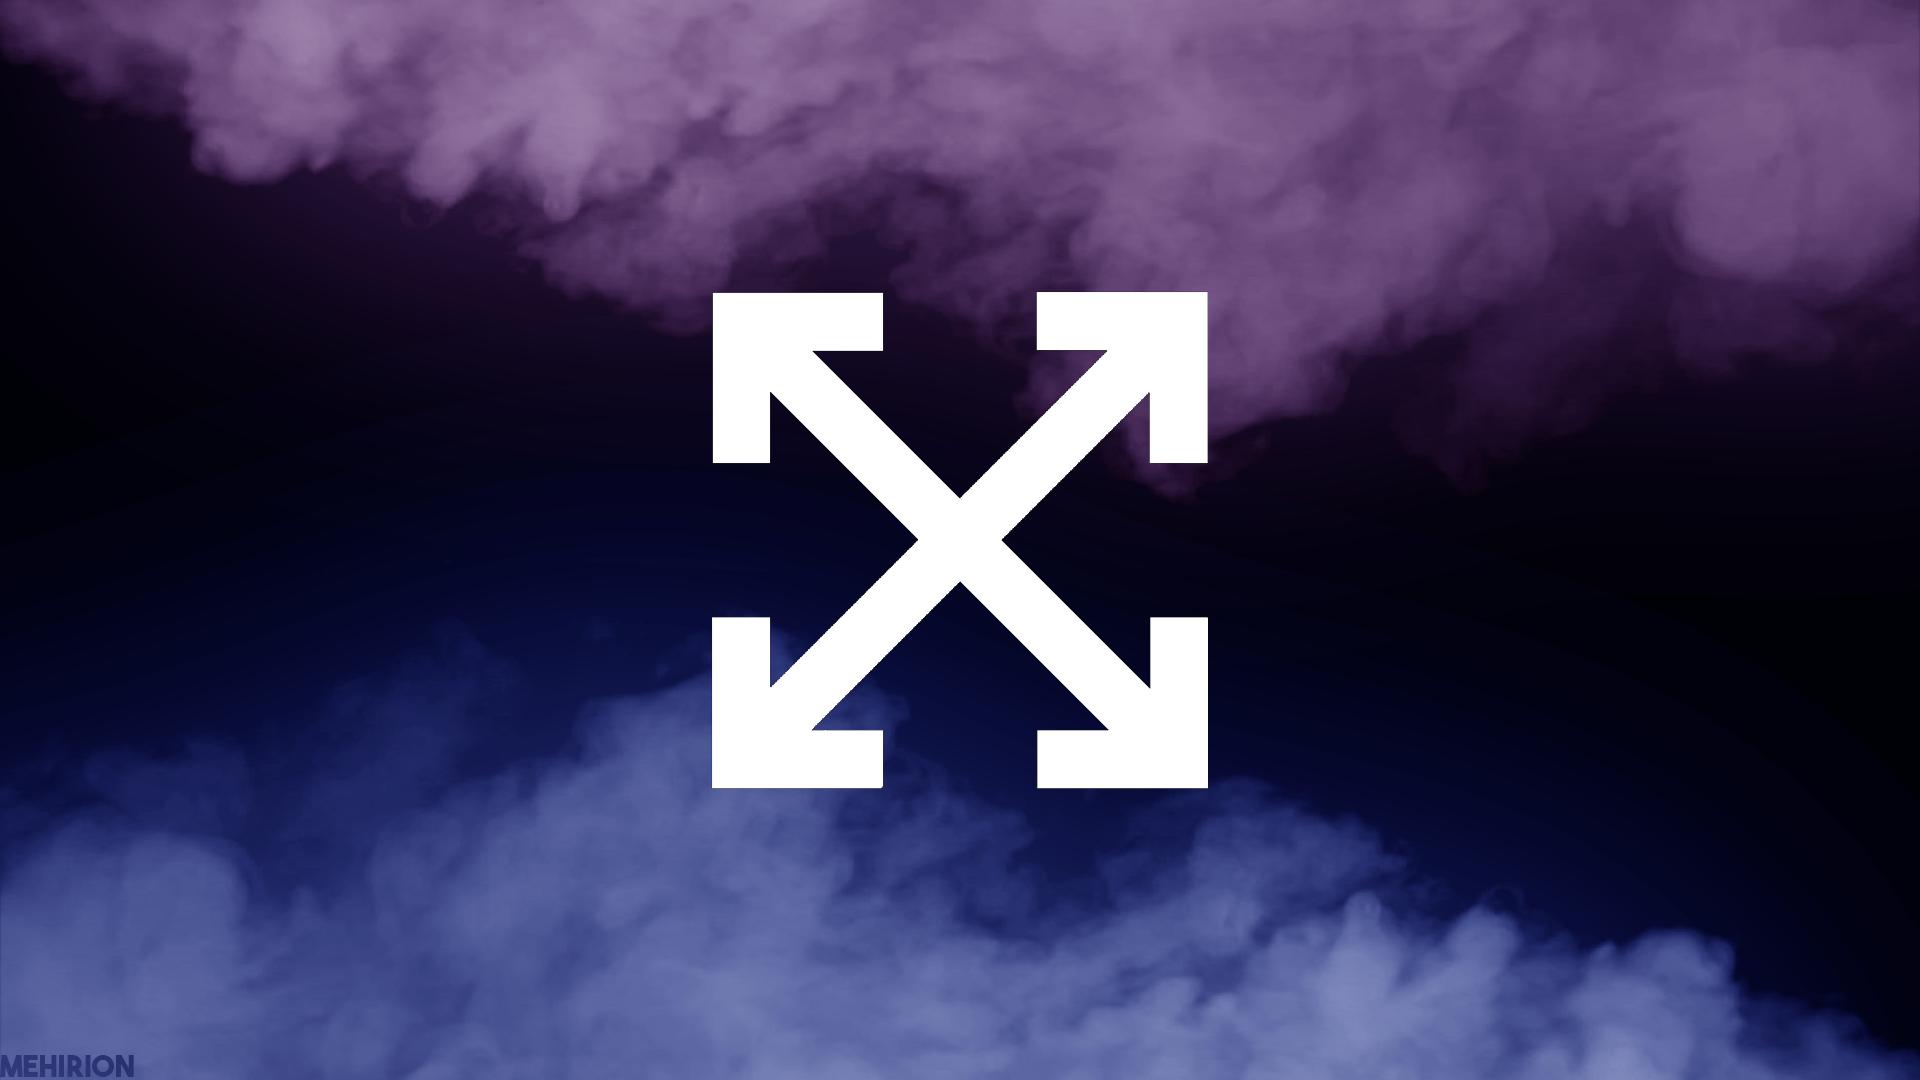 Fashion off white purple blue smoke black simple digital art arrows design